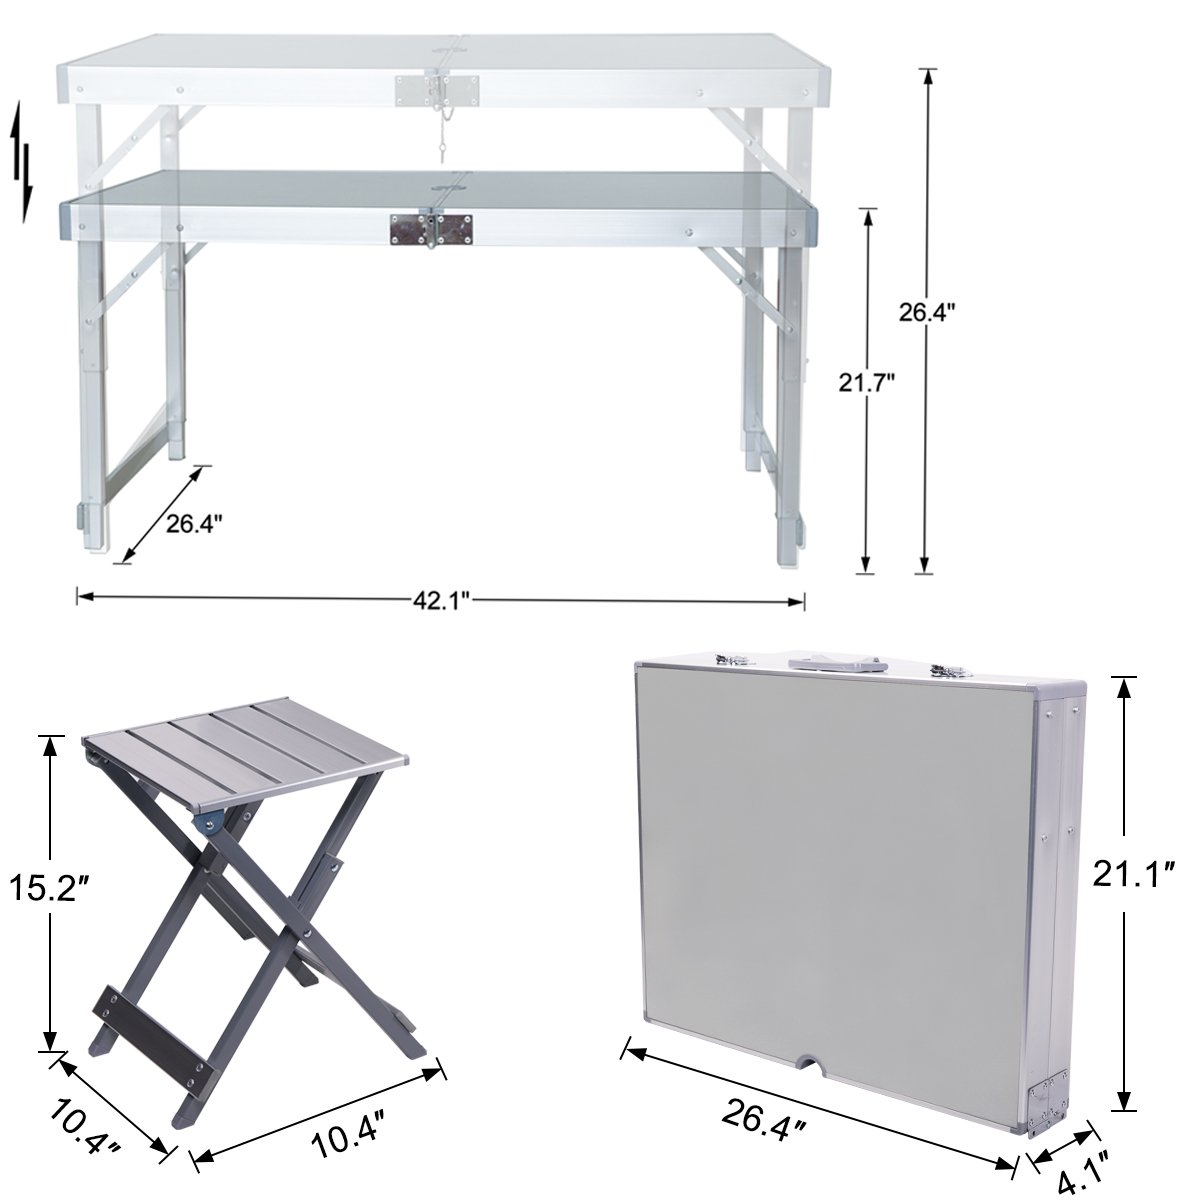 Folding Picnic Table with Umbrella Hole and 4 Folding Stools